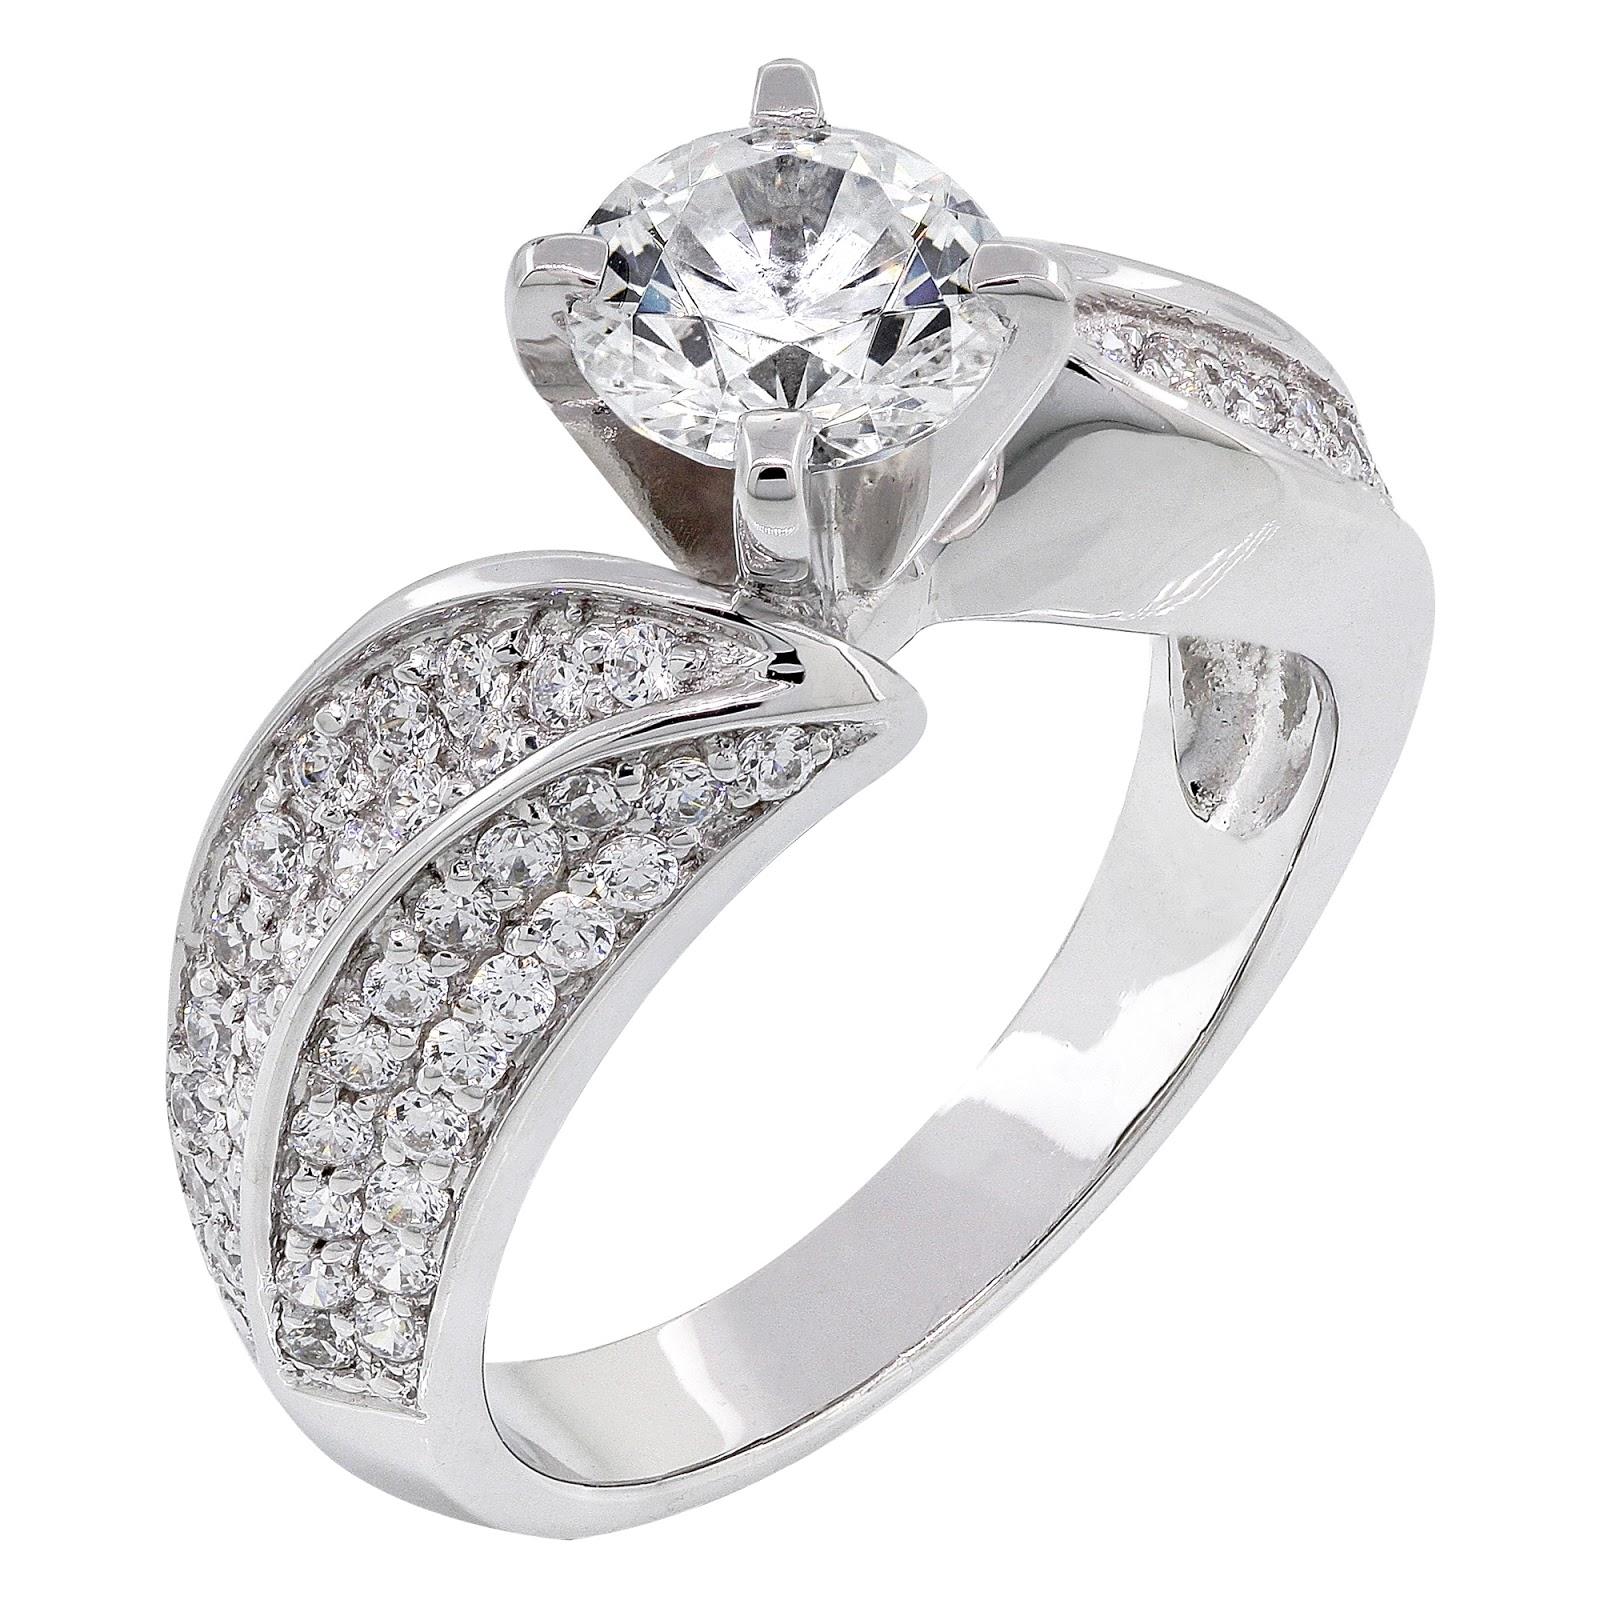 largest diamond ring - photo #30